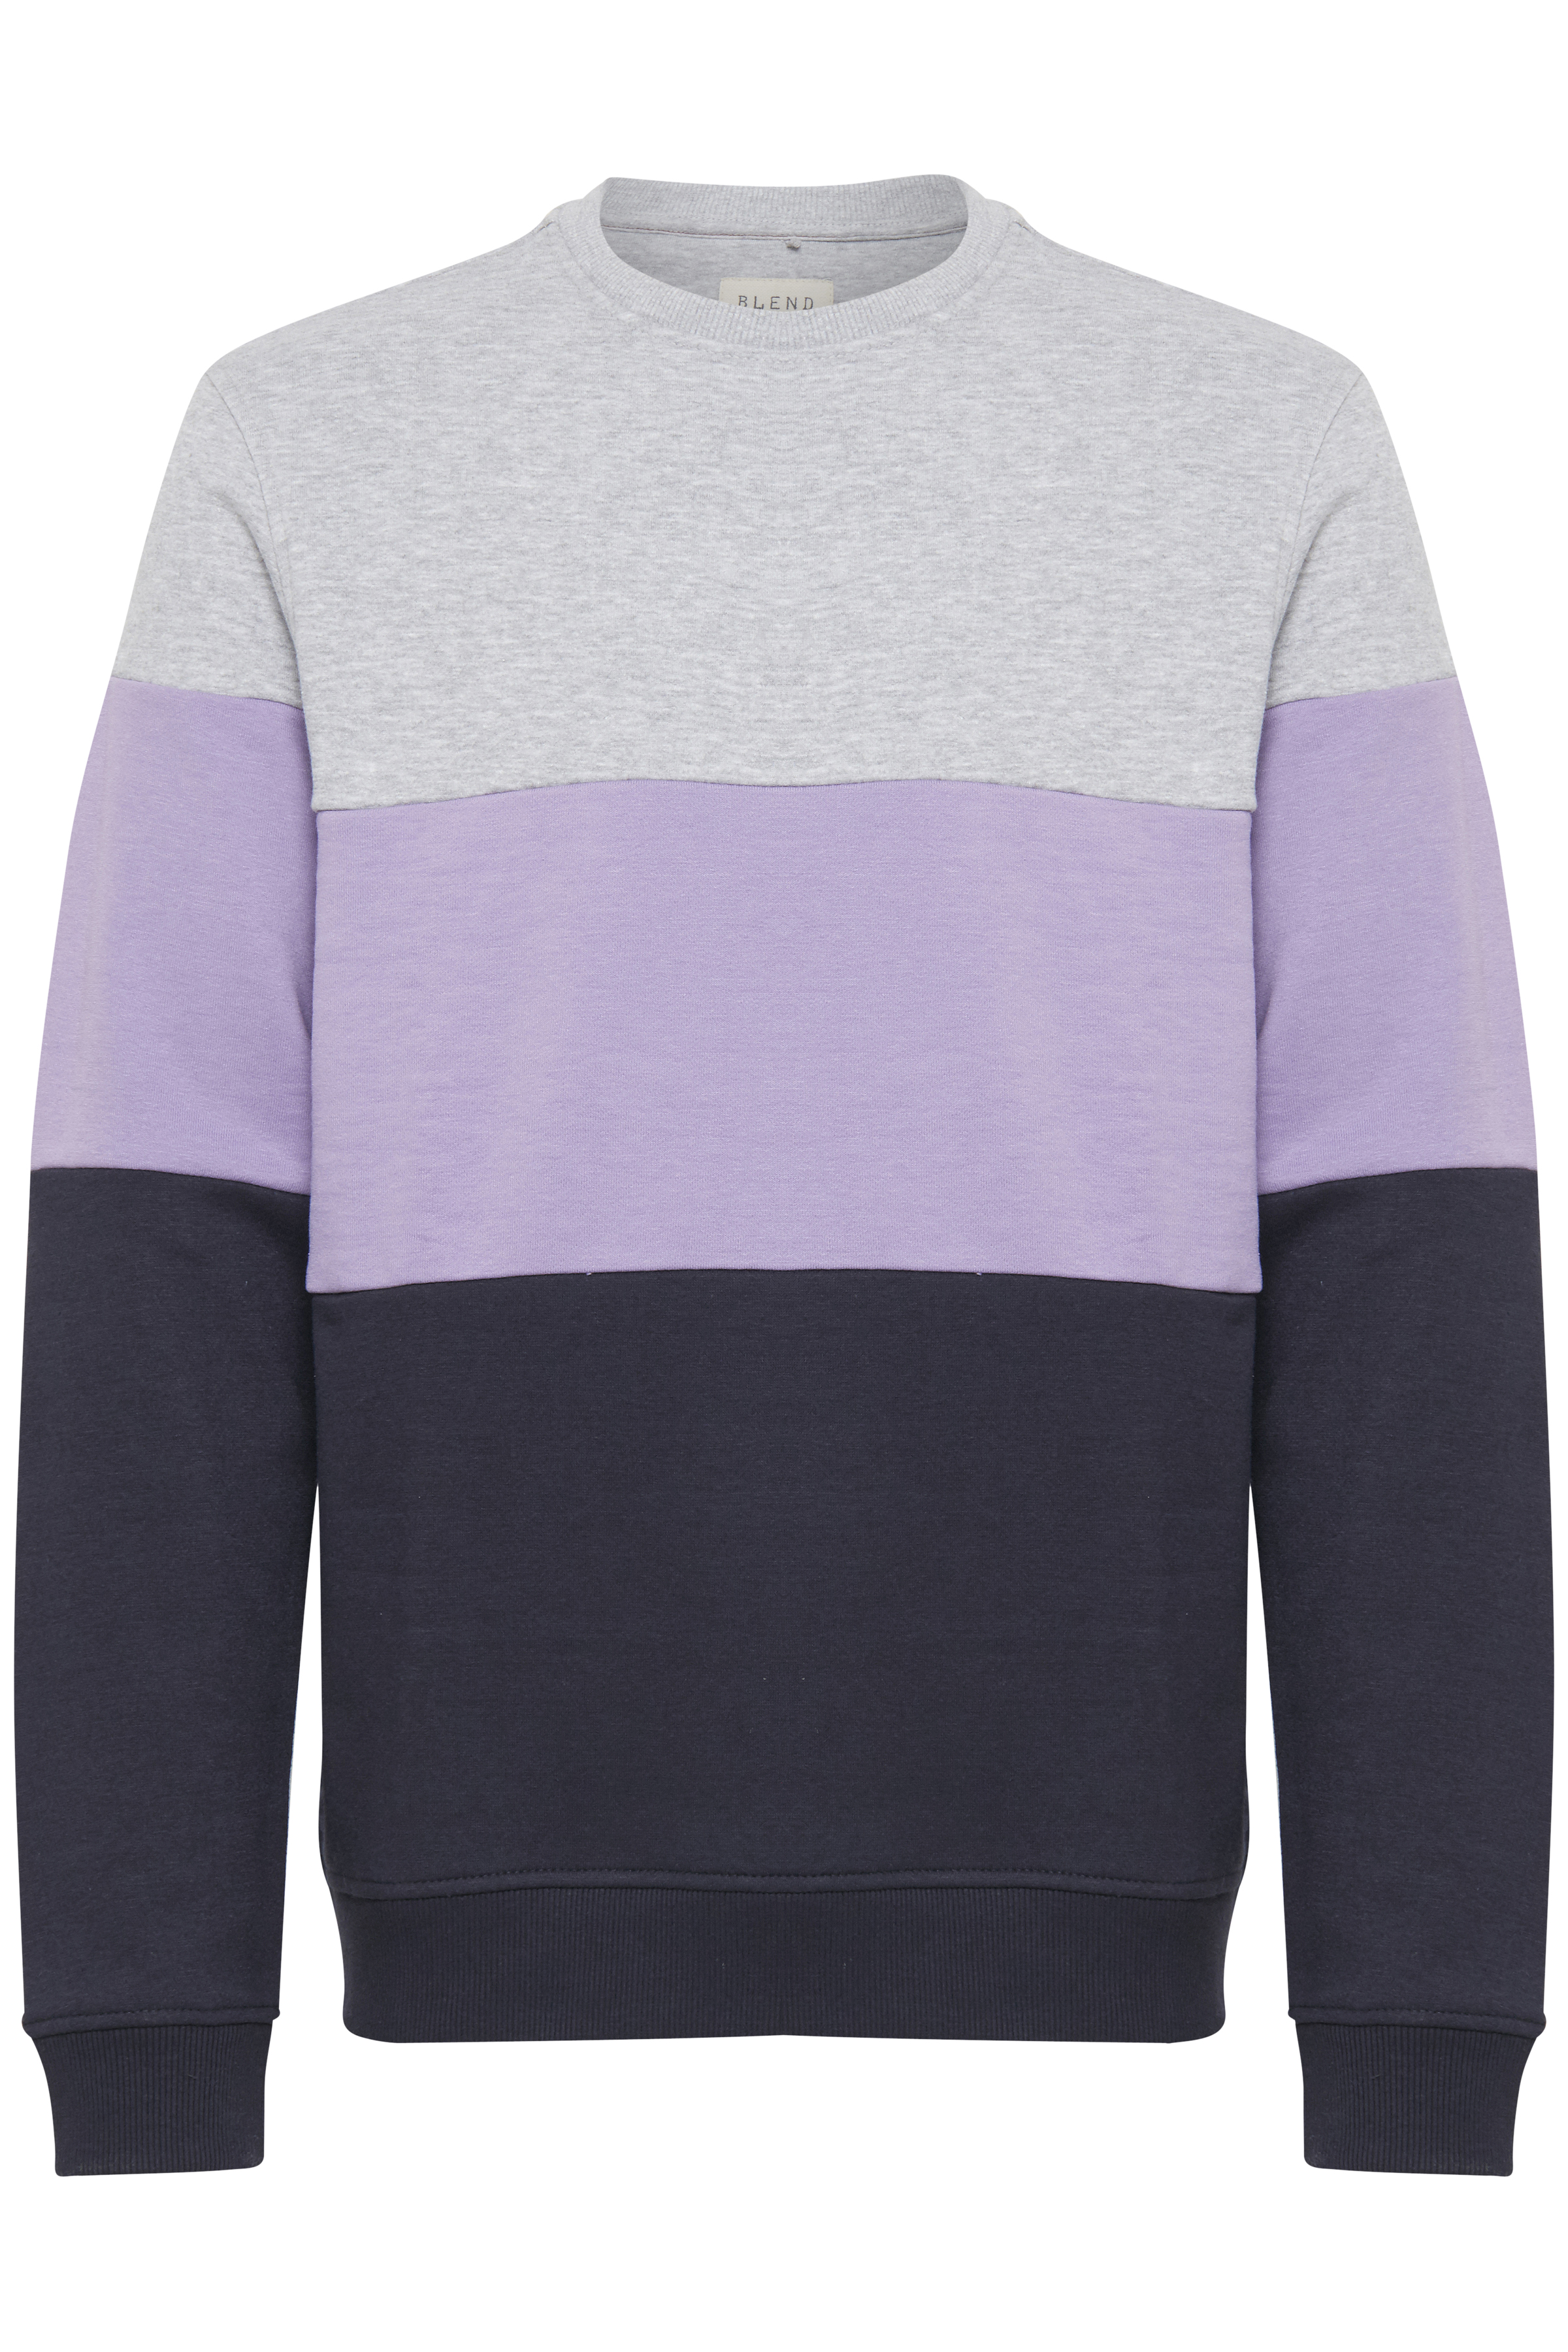 Blend He Herre Sweatshirt - Chalk Purple